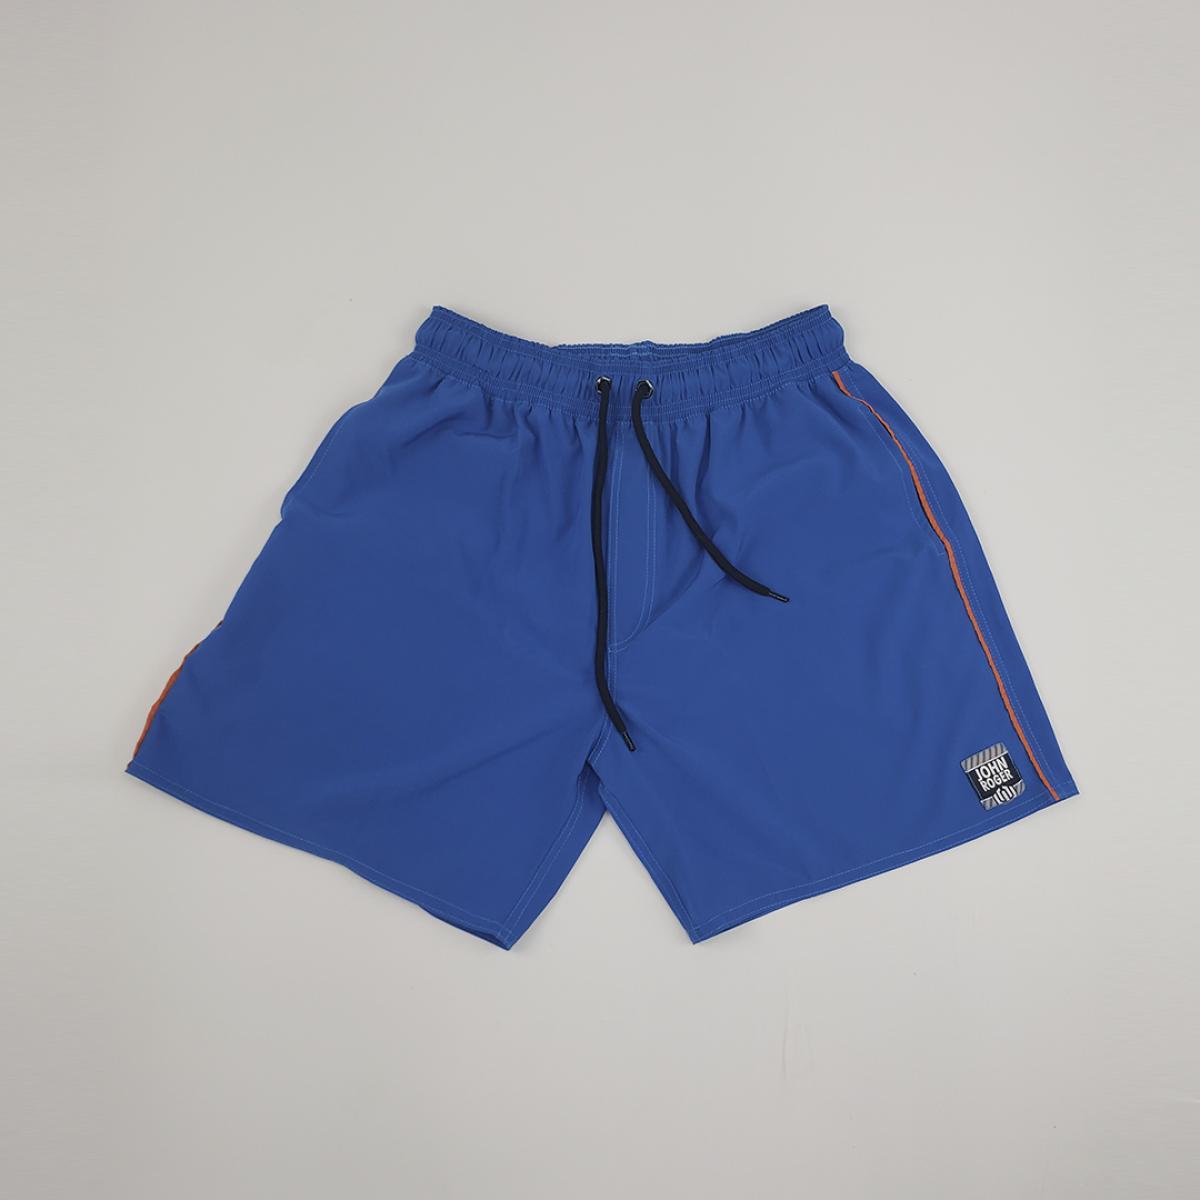 Shorts John Roger - Azul